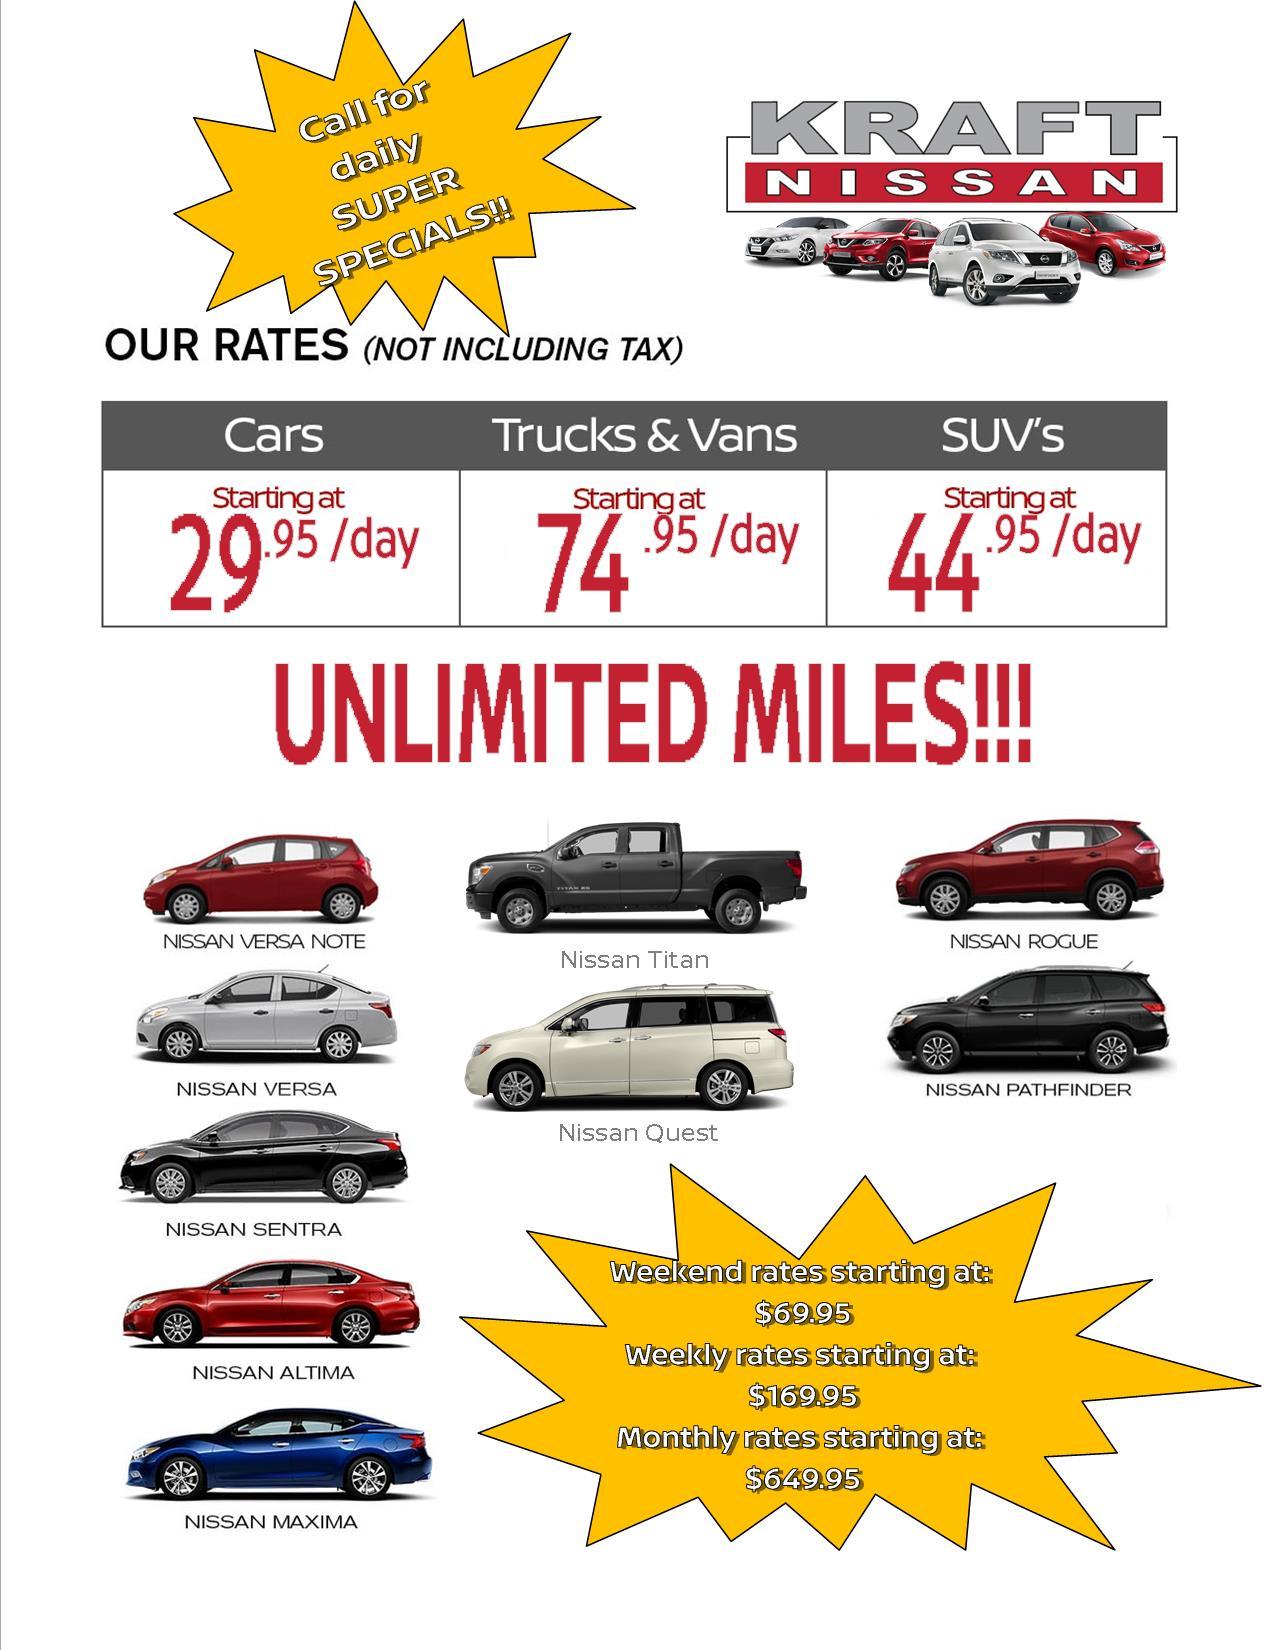 Kraft Nissan Of Tallahassee New Nissan Dealership In